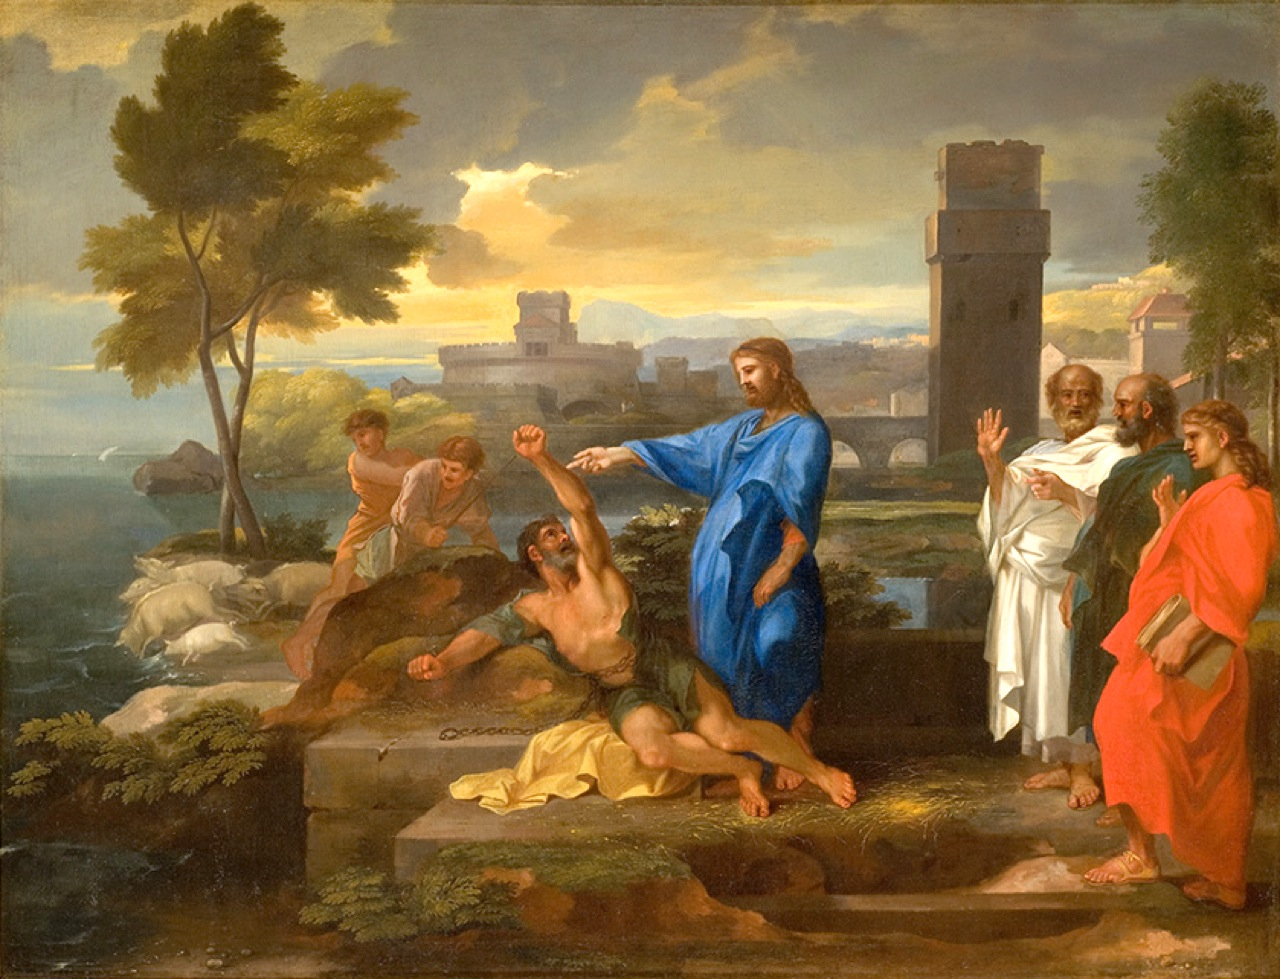 The Gerasene Demoniac  by Sebastian Bourdon (1653)